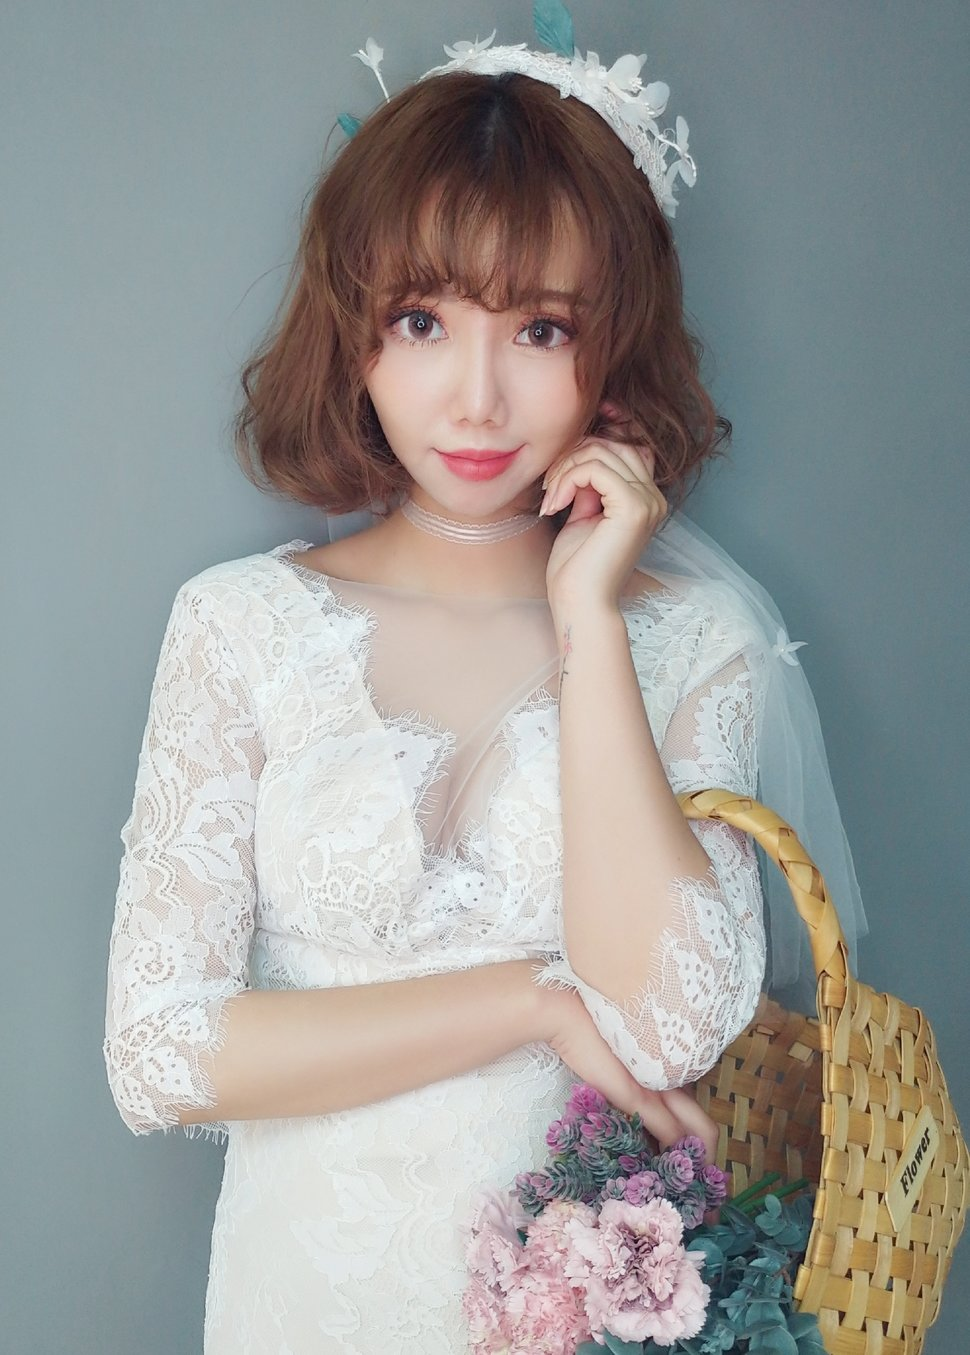 73FDC425-800C-471B-BFF4-72E0EC50A7DB - Nanami 張慈慈《結婚吧》